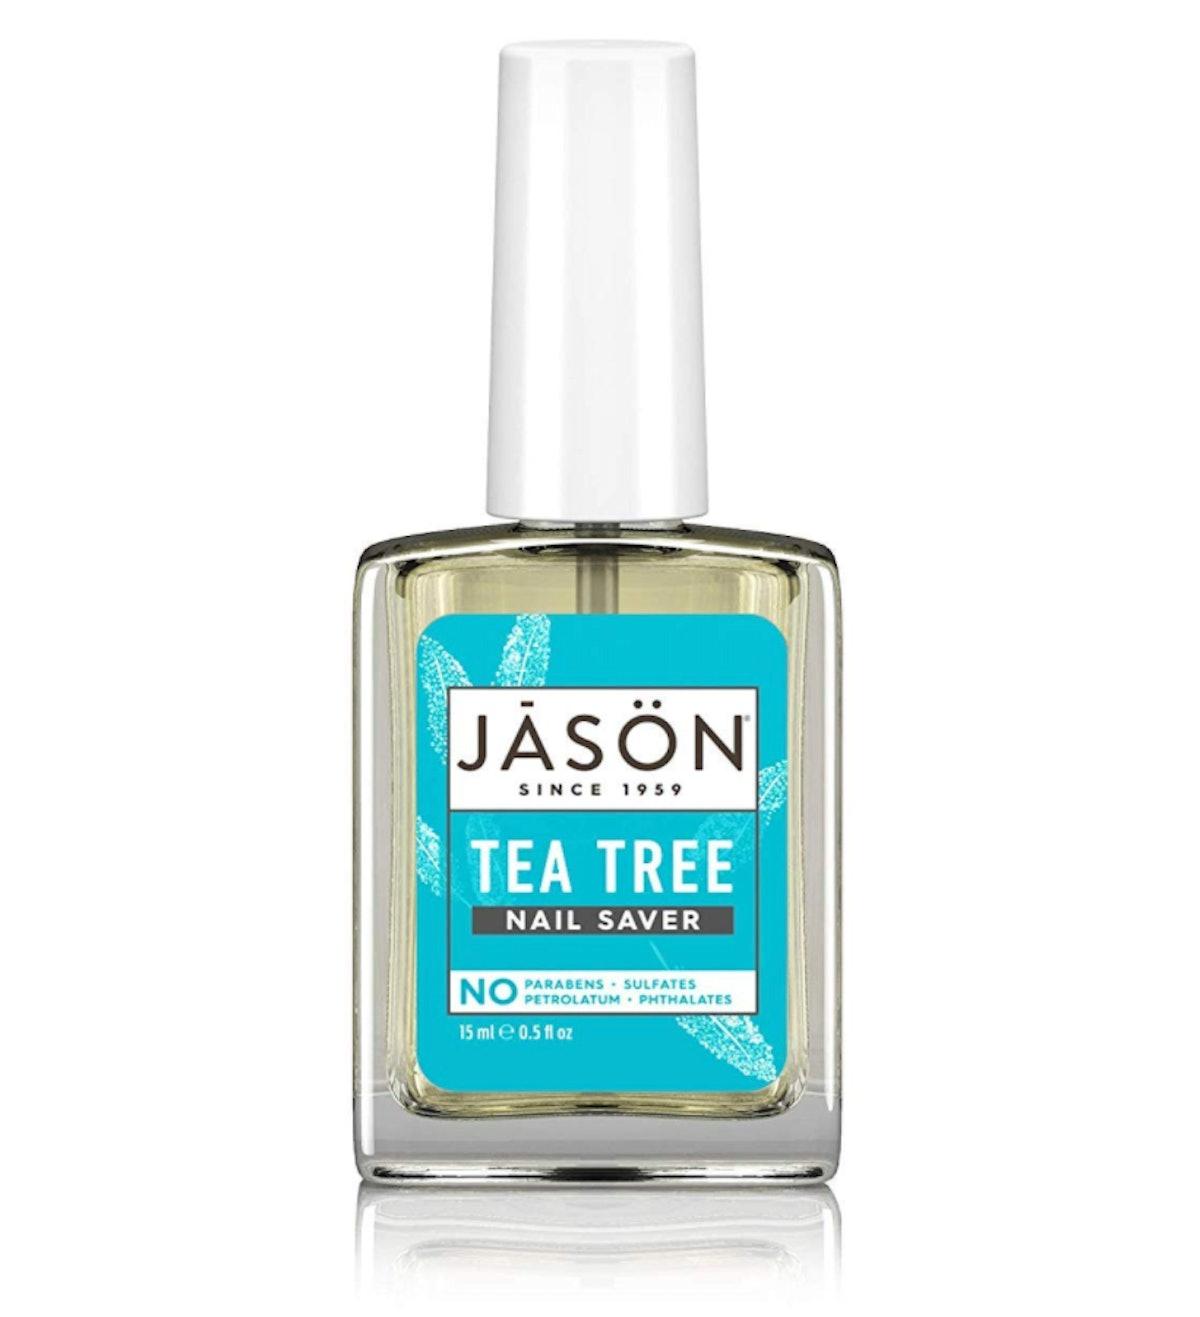 Jason Nail Saver Tea Tree Oil